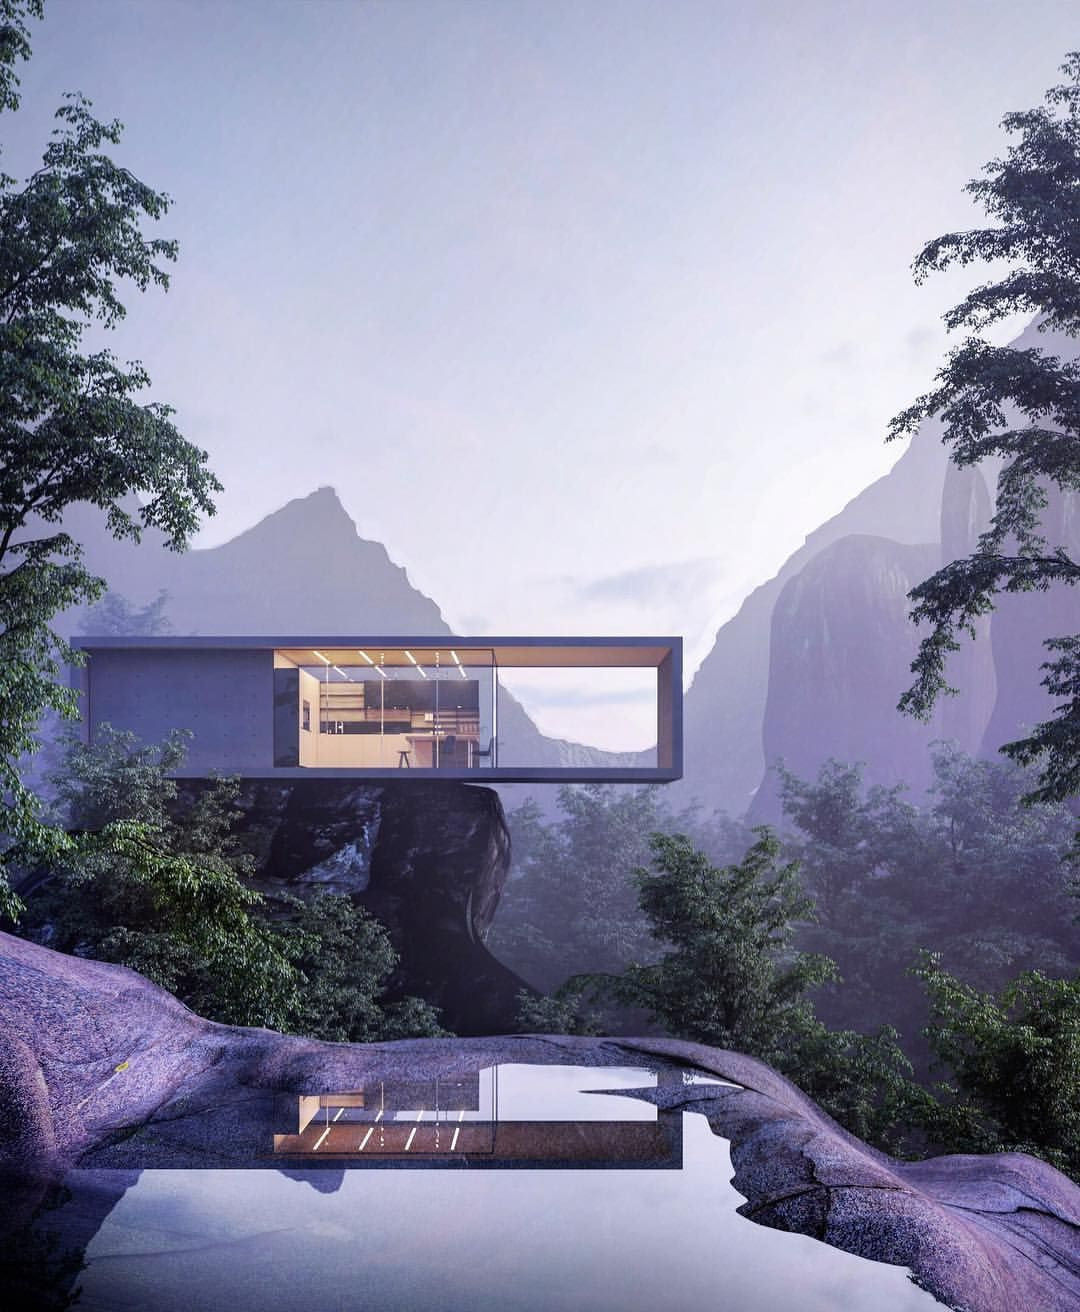 geile Häuser